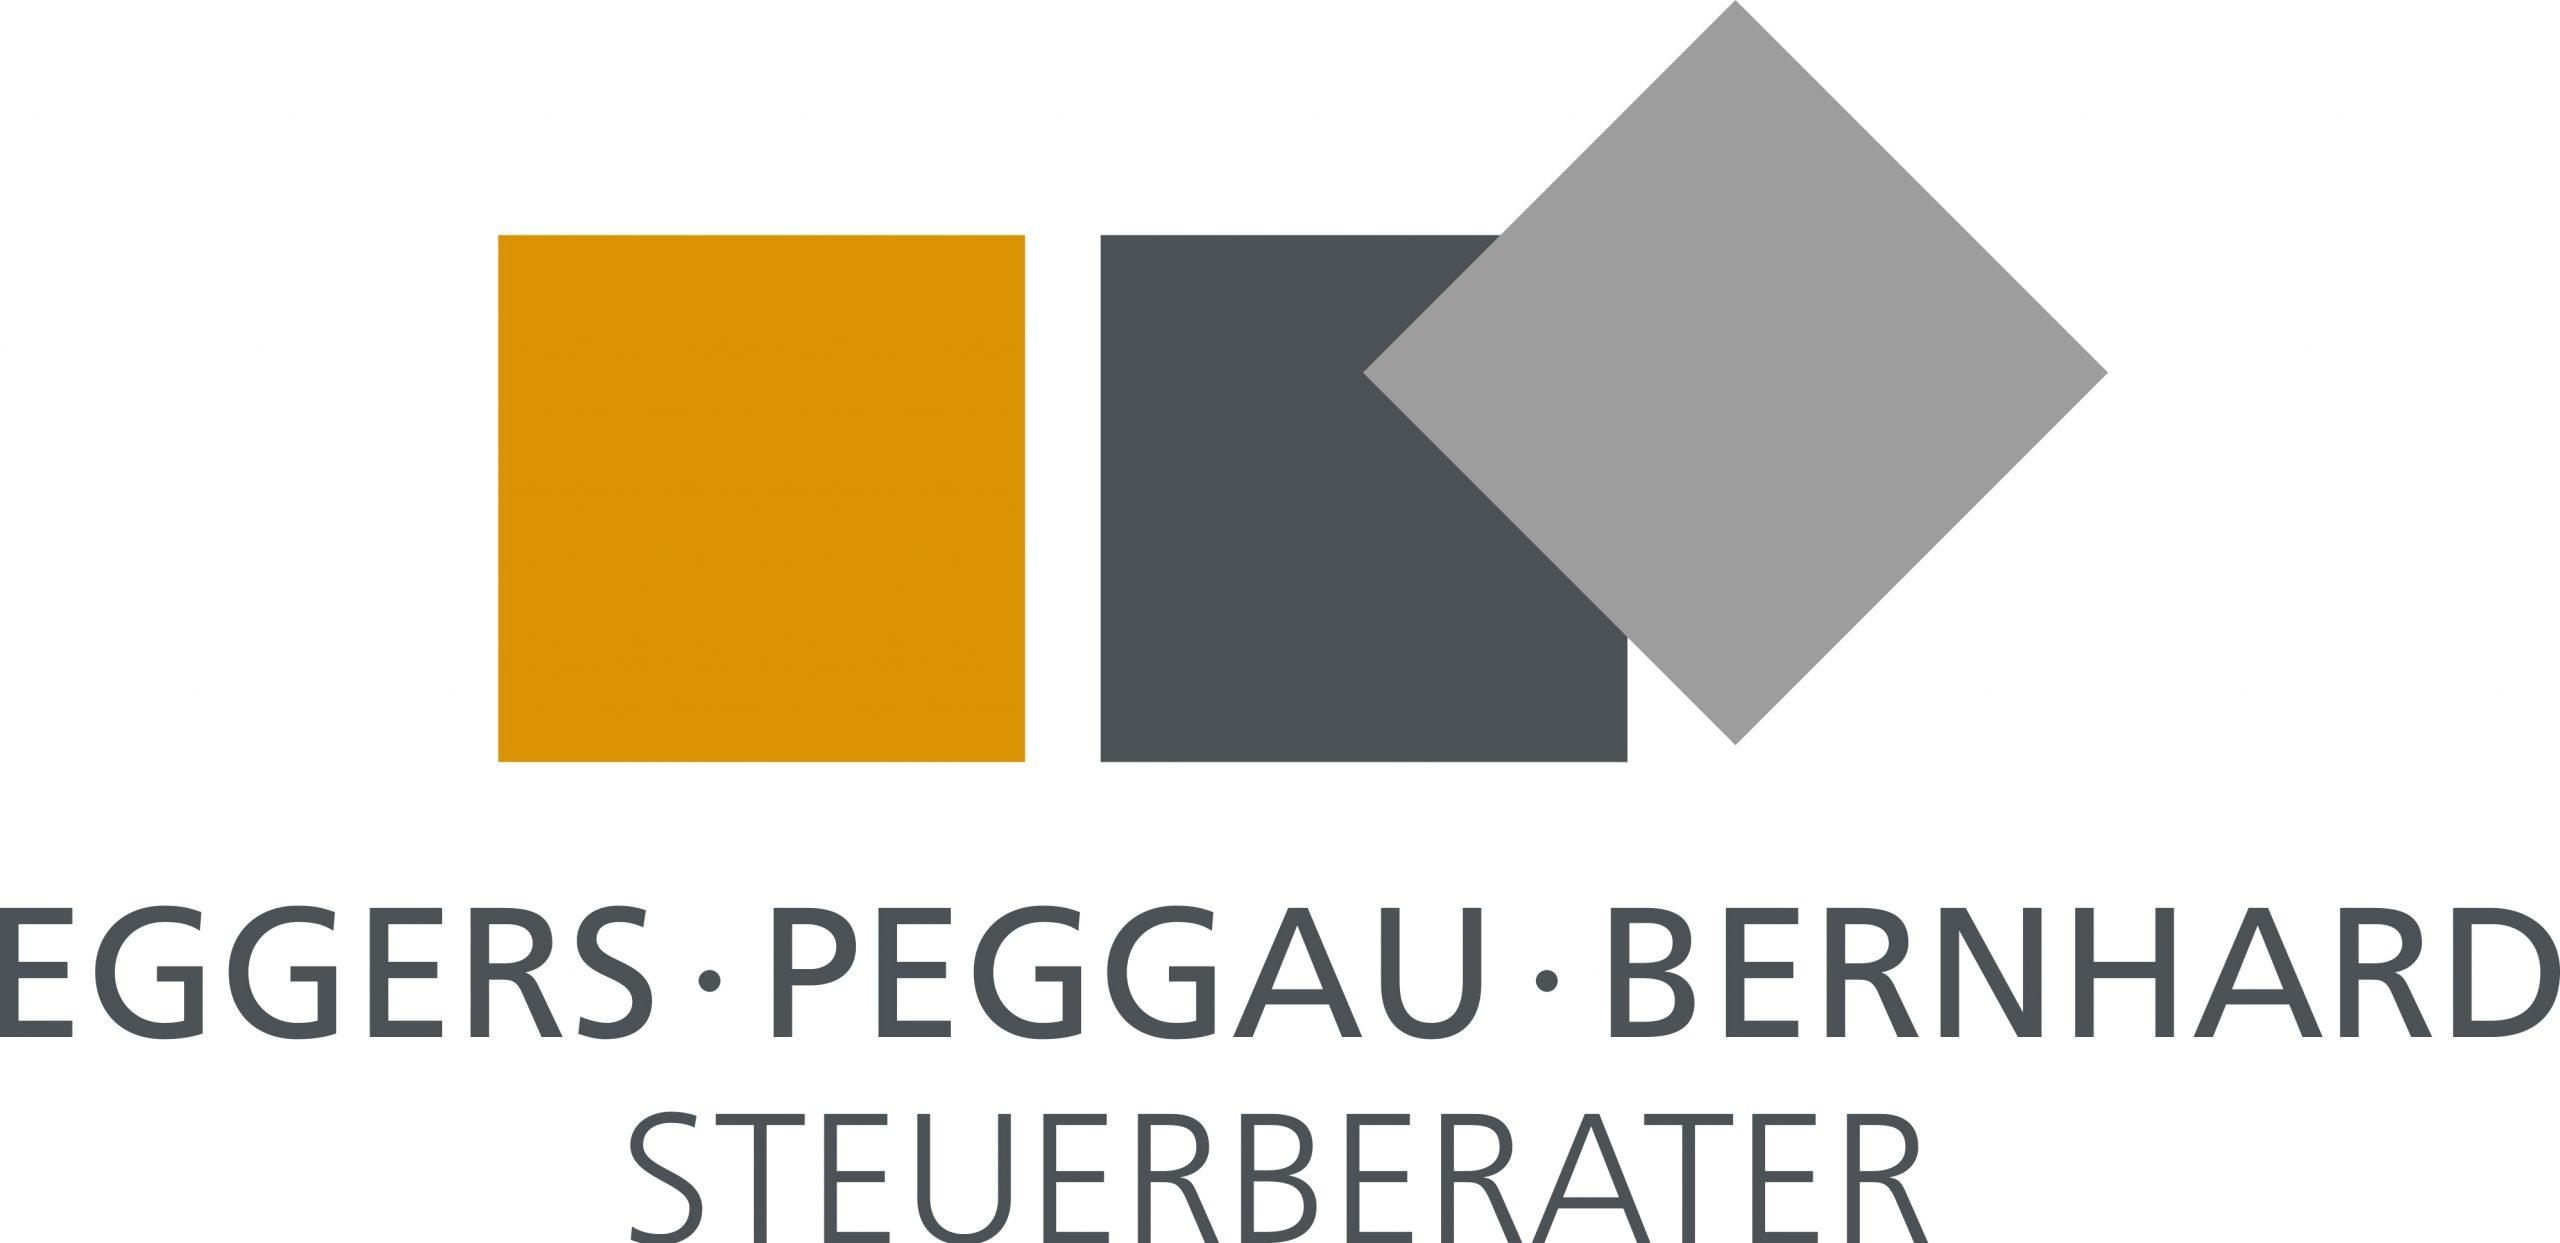 Eggers - Peggau - Bernhard